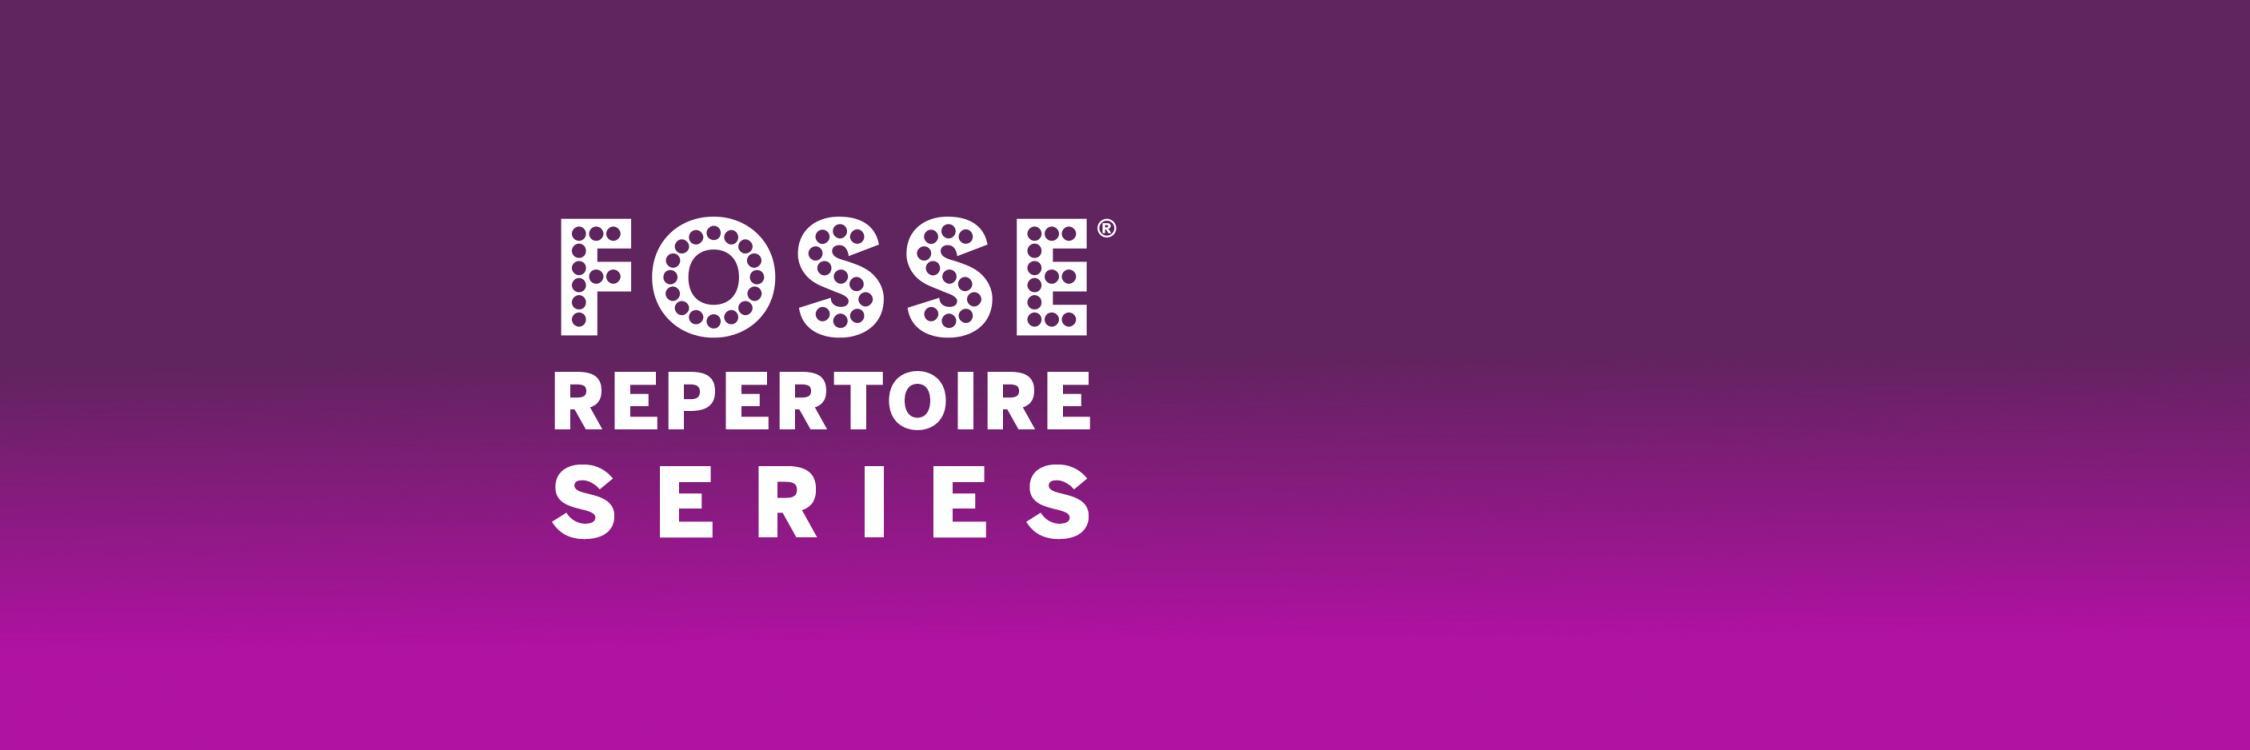 Fosse Repertoire Series